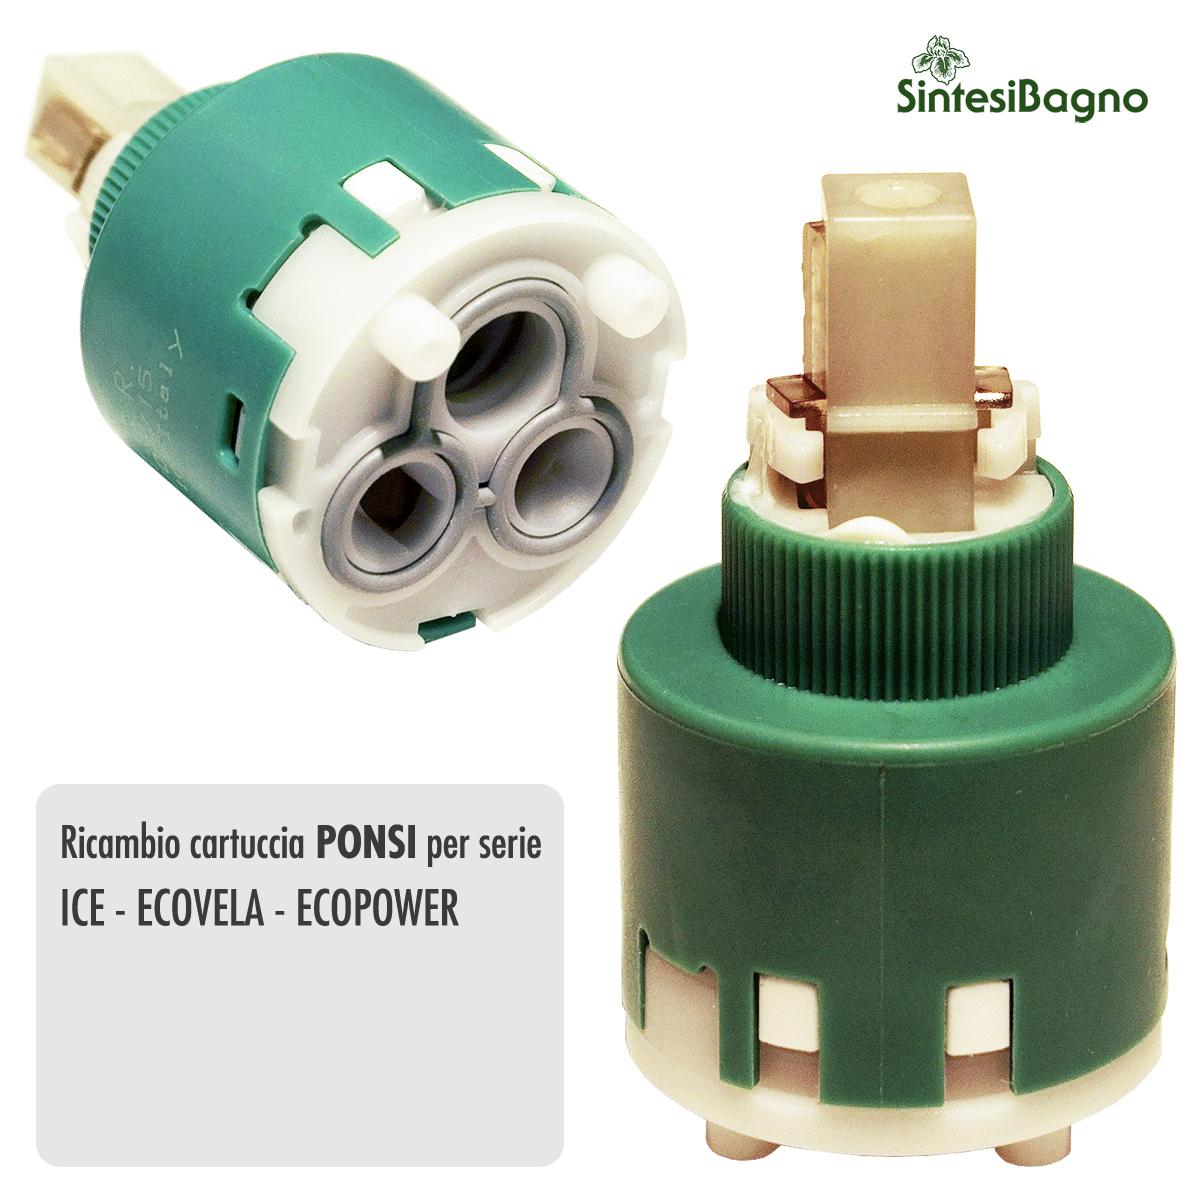 Cartuccia PONSI Ø 35 per miscelatore ICE/ECOVELA/ECOPOWER - BTRICCCA07